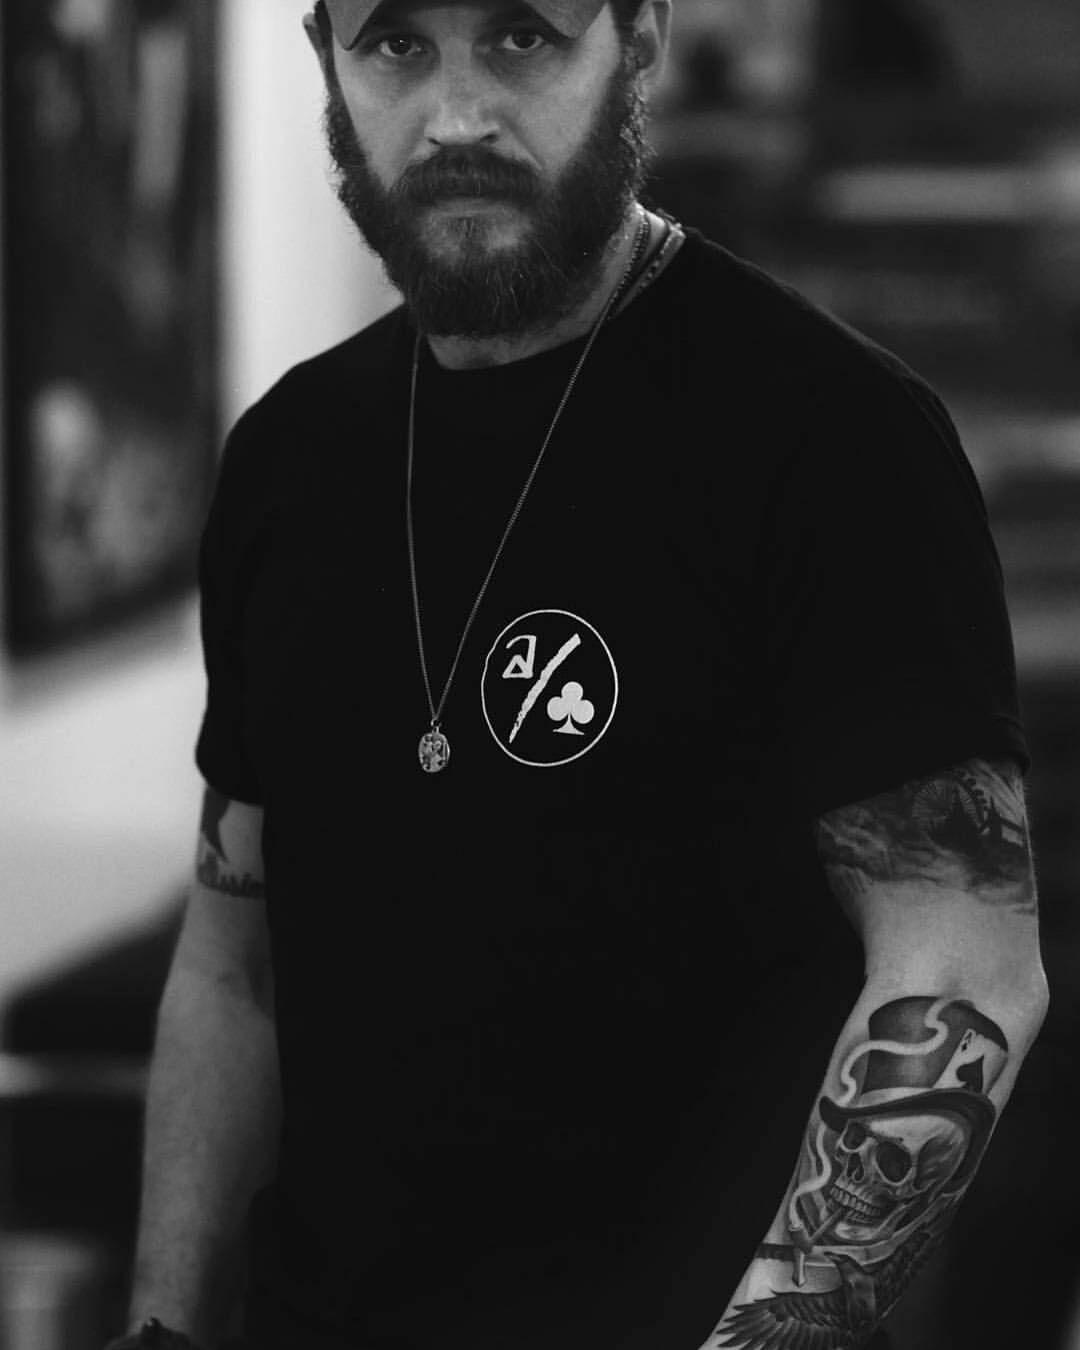 Actor Porno B A R Cuchillo Tatuado nuevo tatuaje de #tomhardy por #jumcha . #tattoo #tatuajes